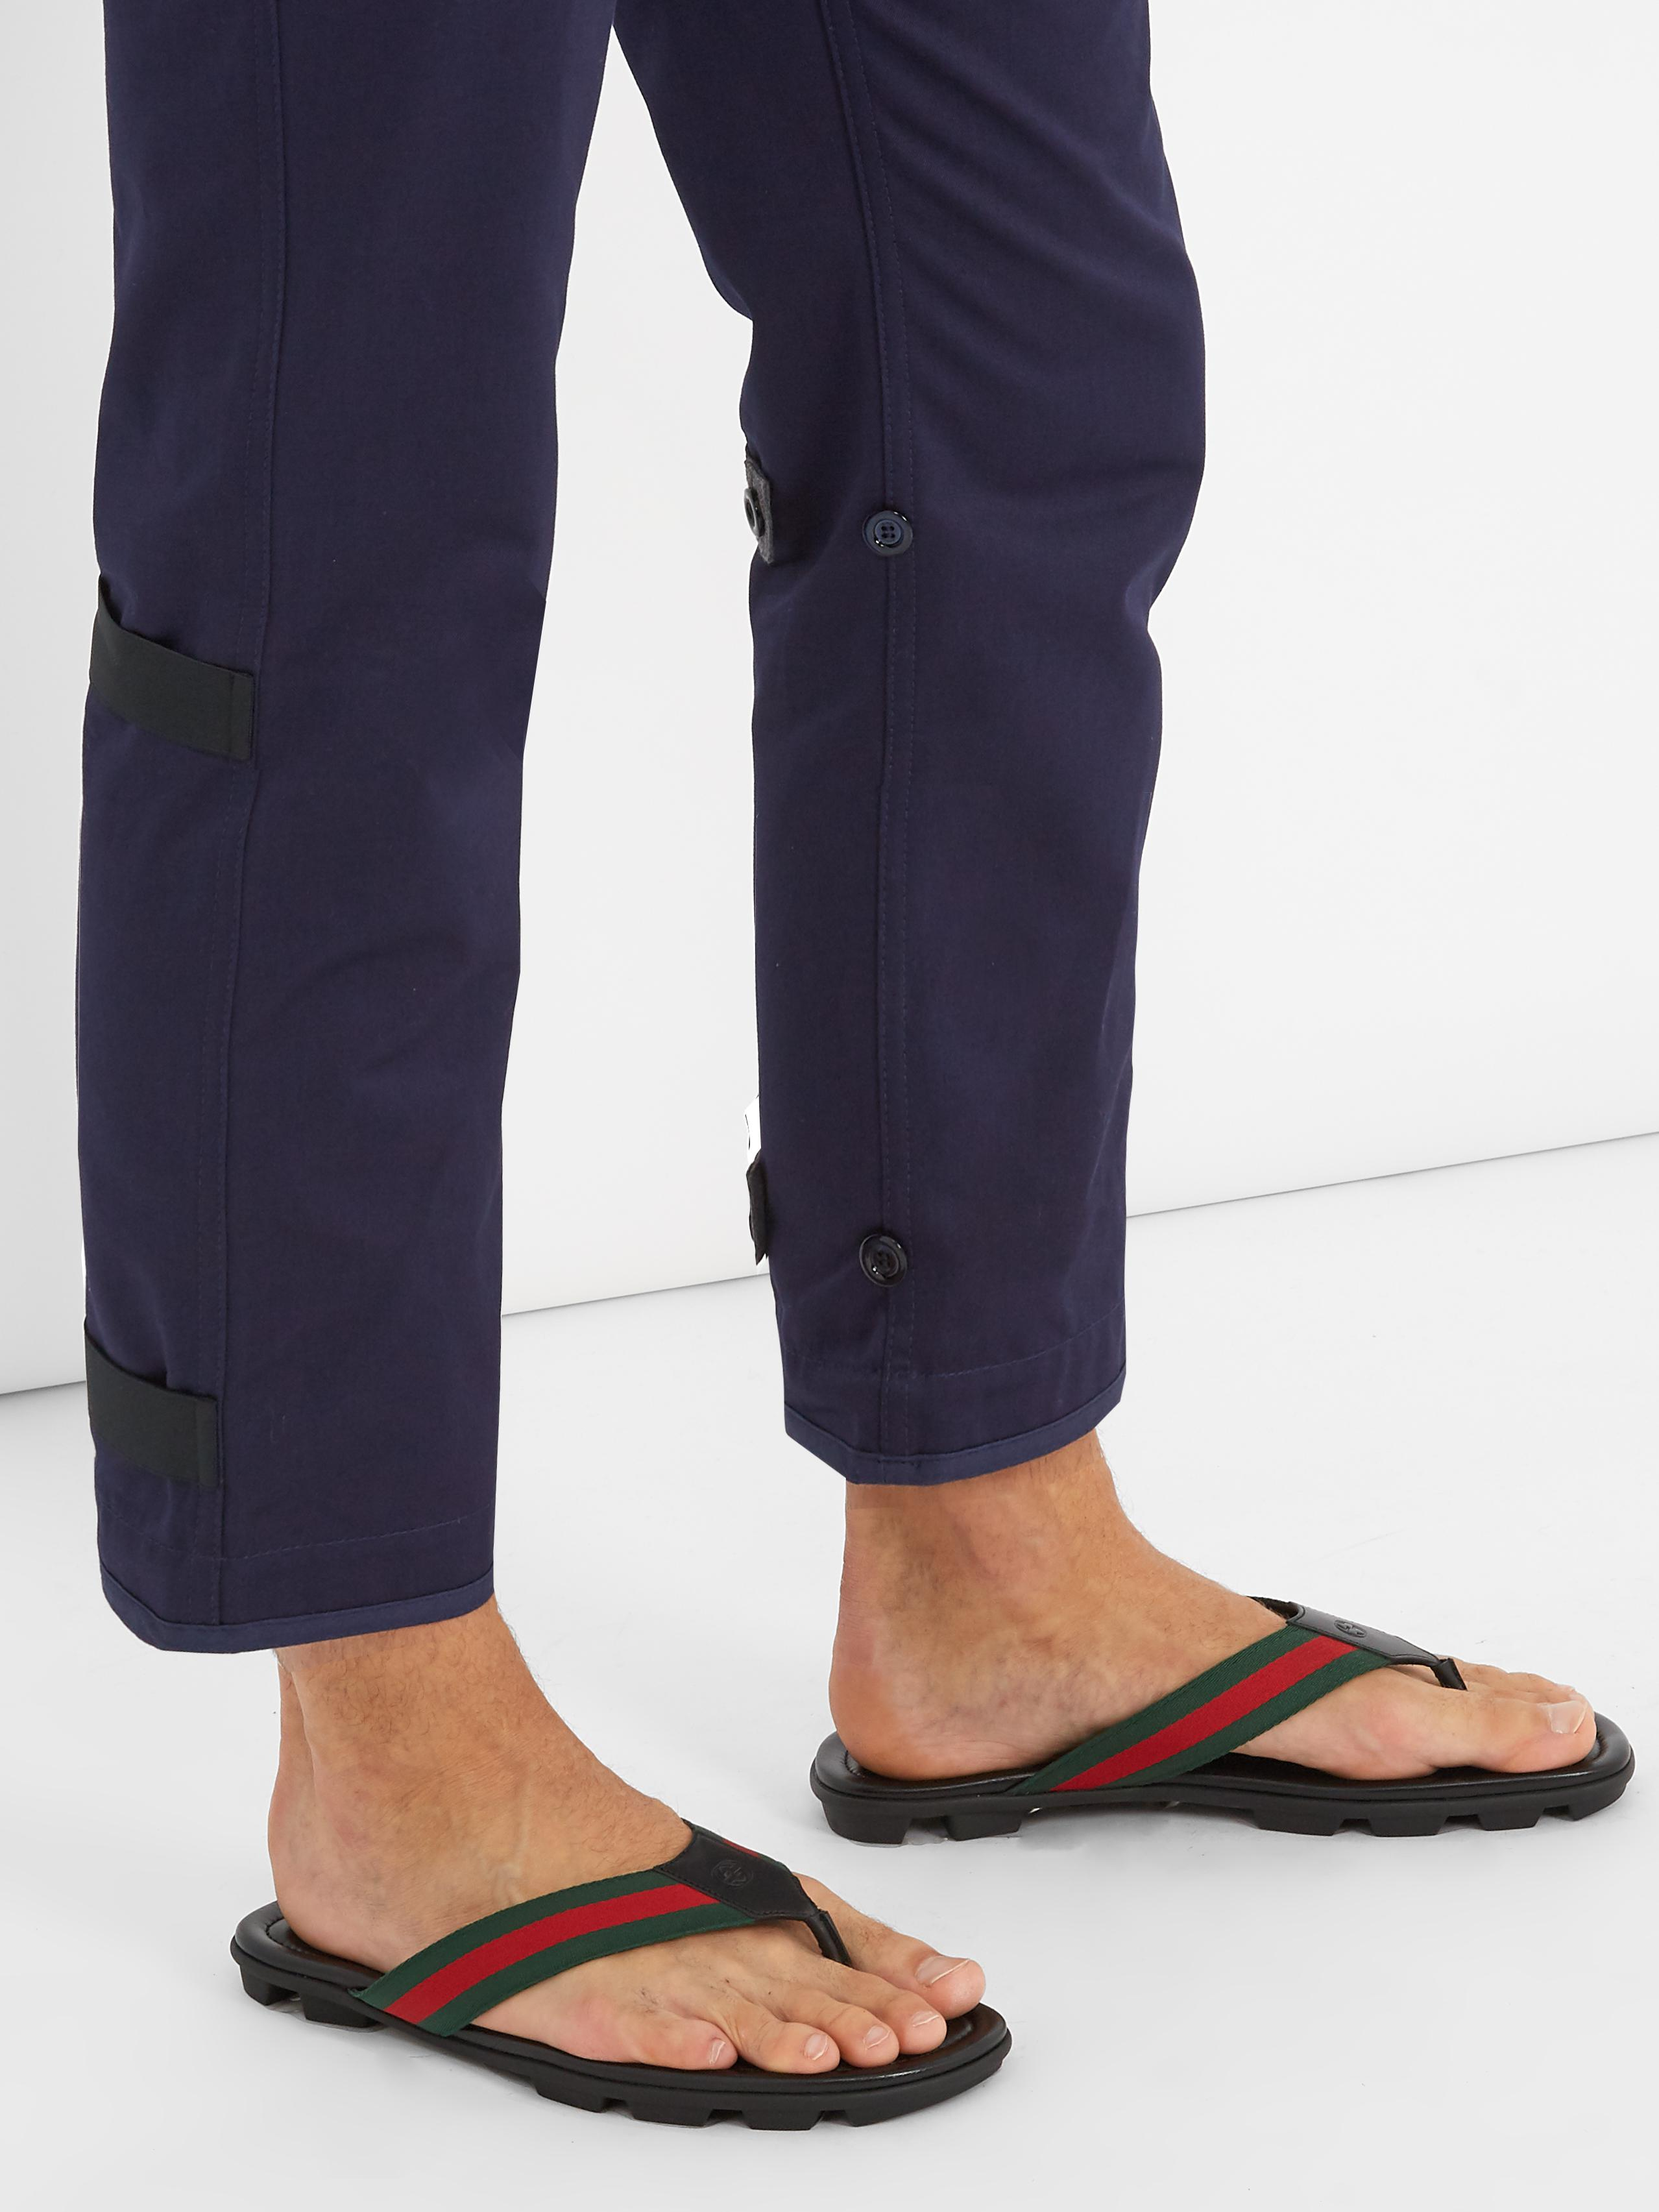 8be6361656f7 Lyst - Gucci Titan Web-striped Flip-flops in Black for Men